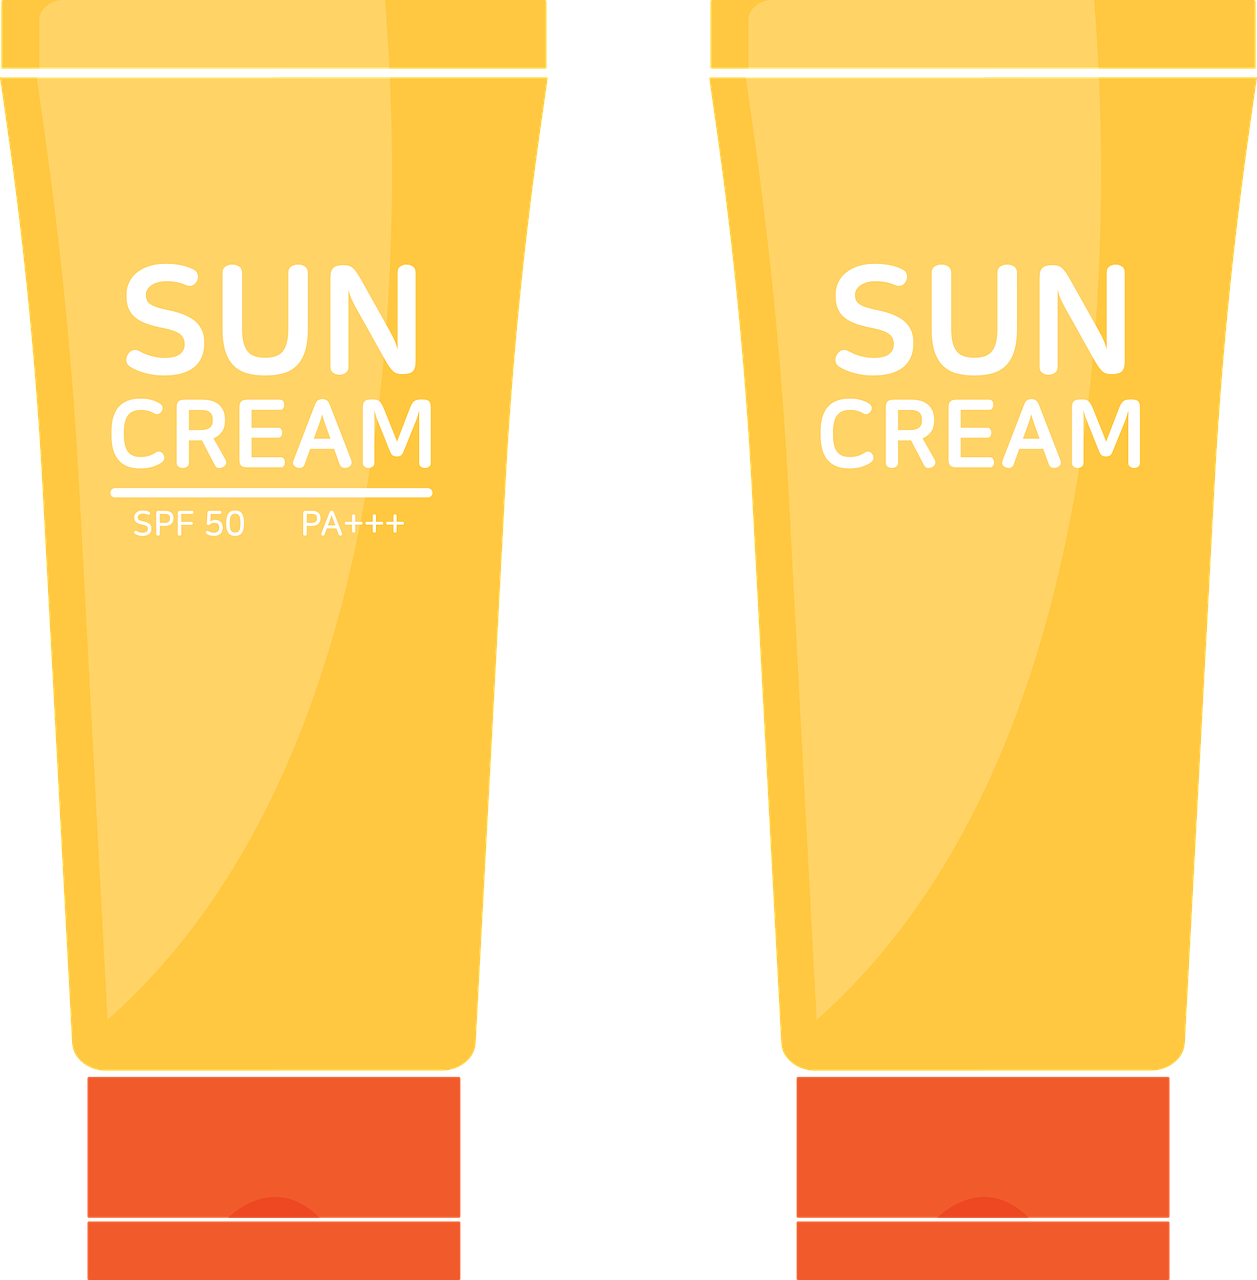 sun-cream-4617746_1280.png